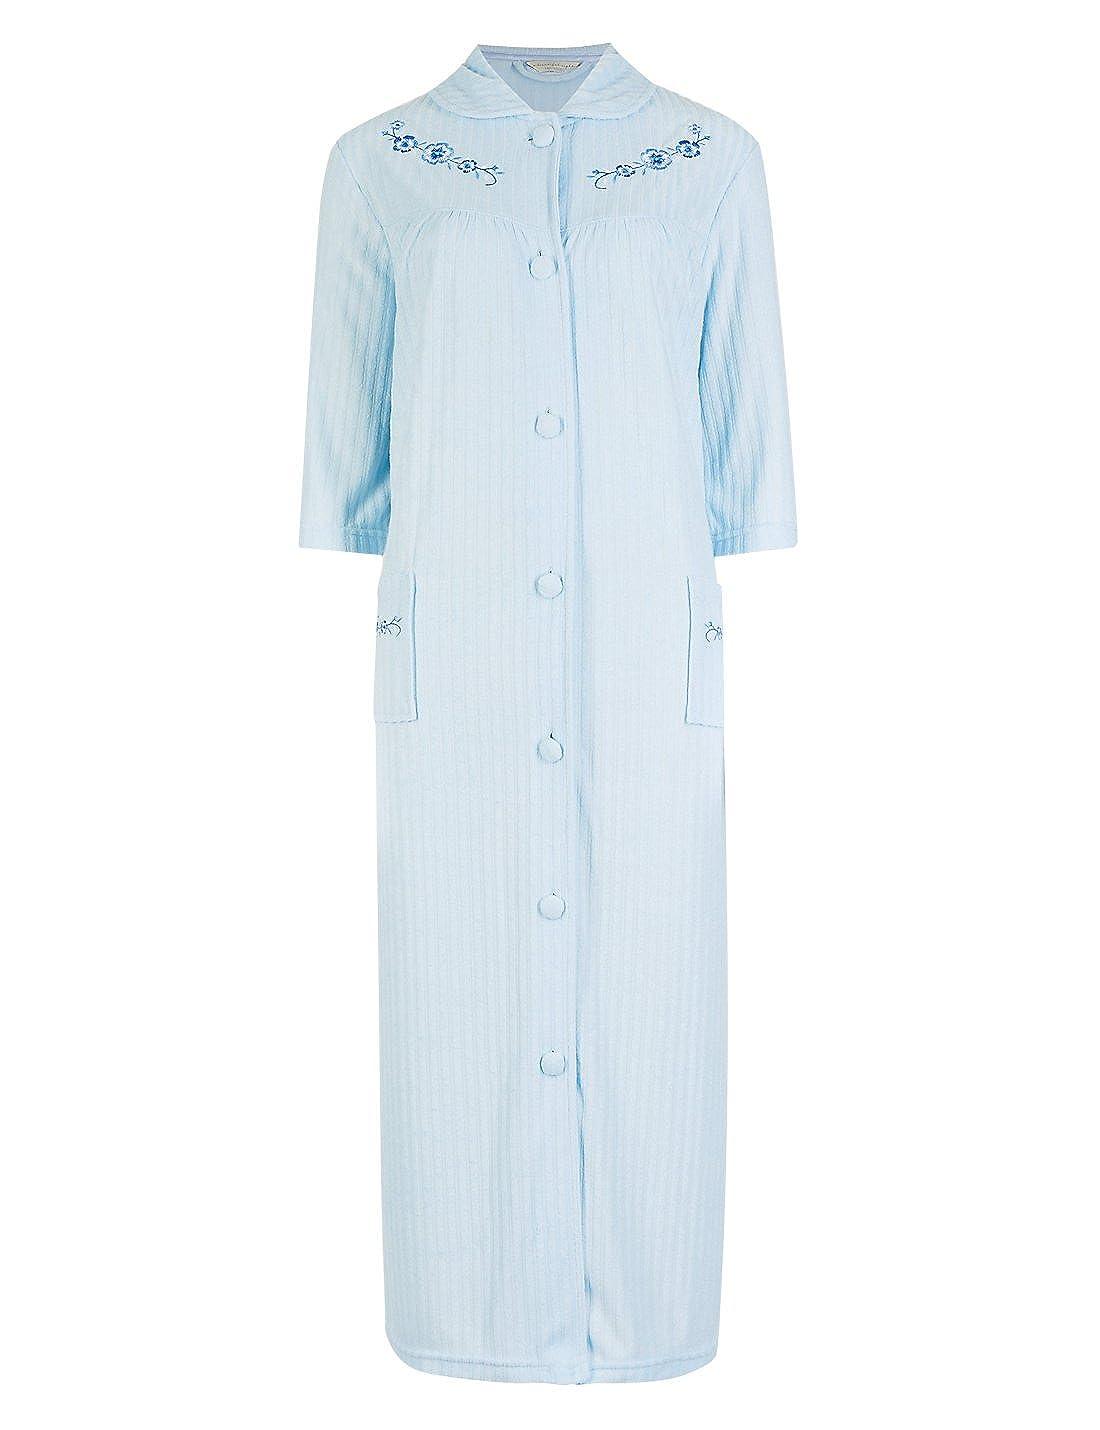 Short Standard Length Sizes 8-10 12-14 16-18 20-22 Blue Ladies Famous Make Light Towelling Dressing Gown